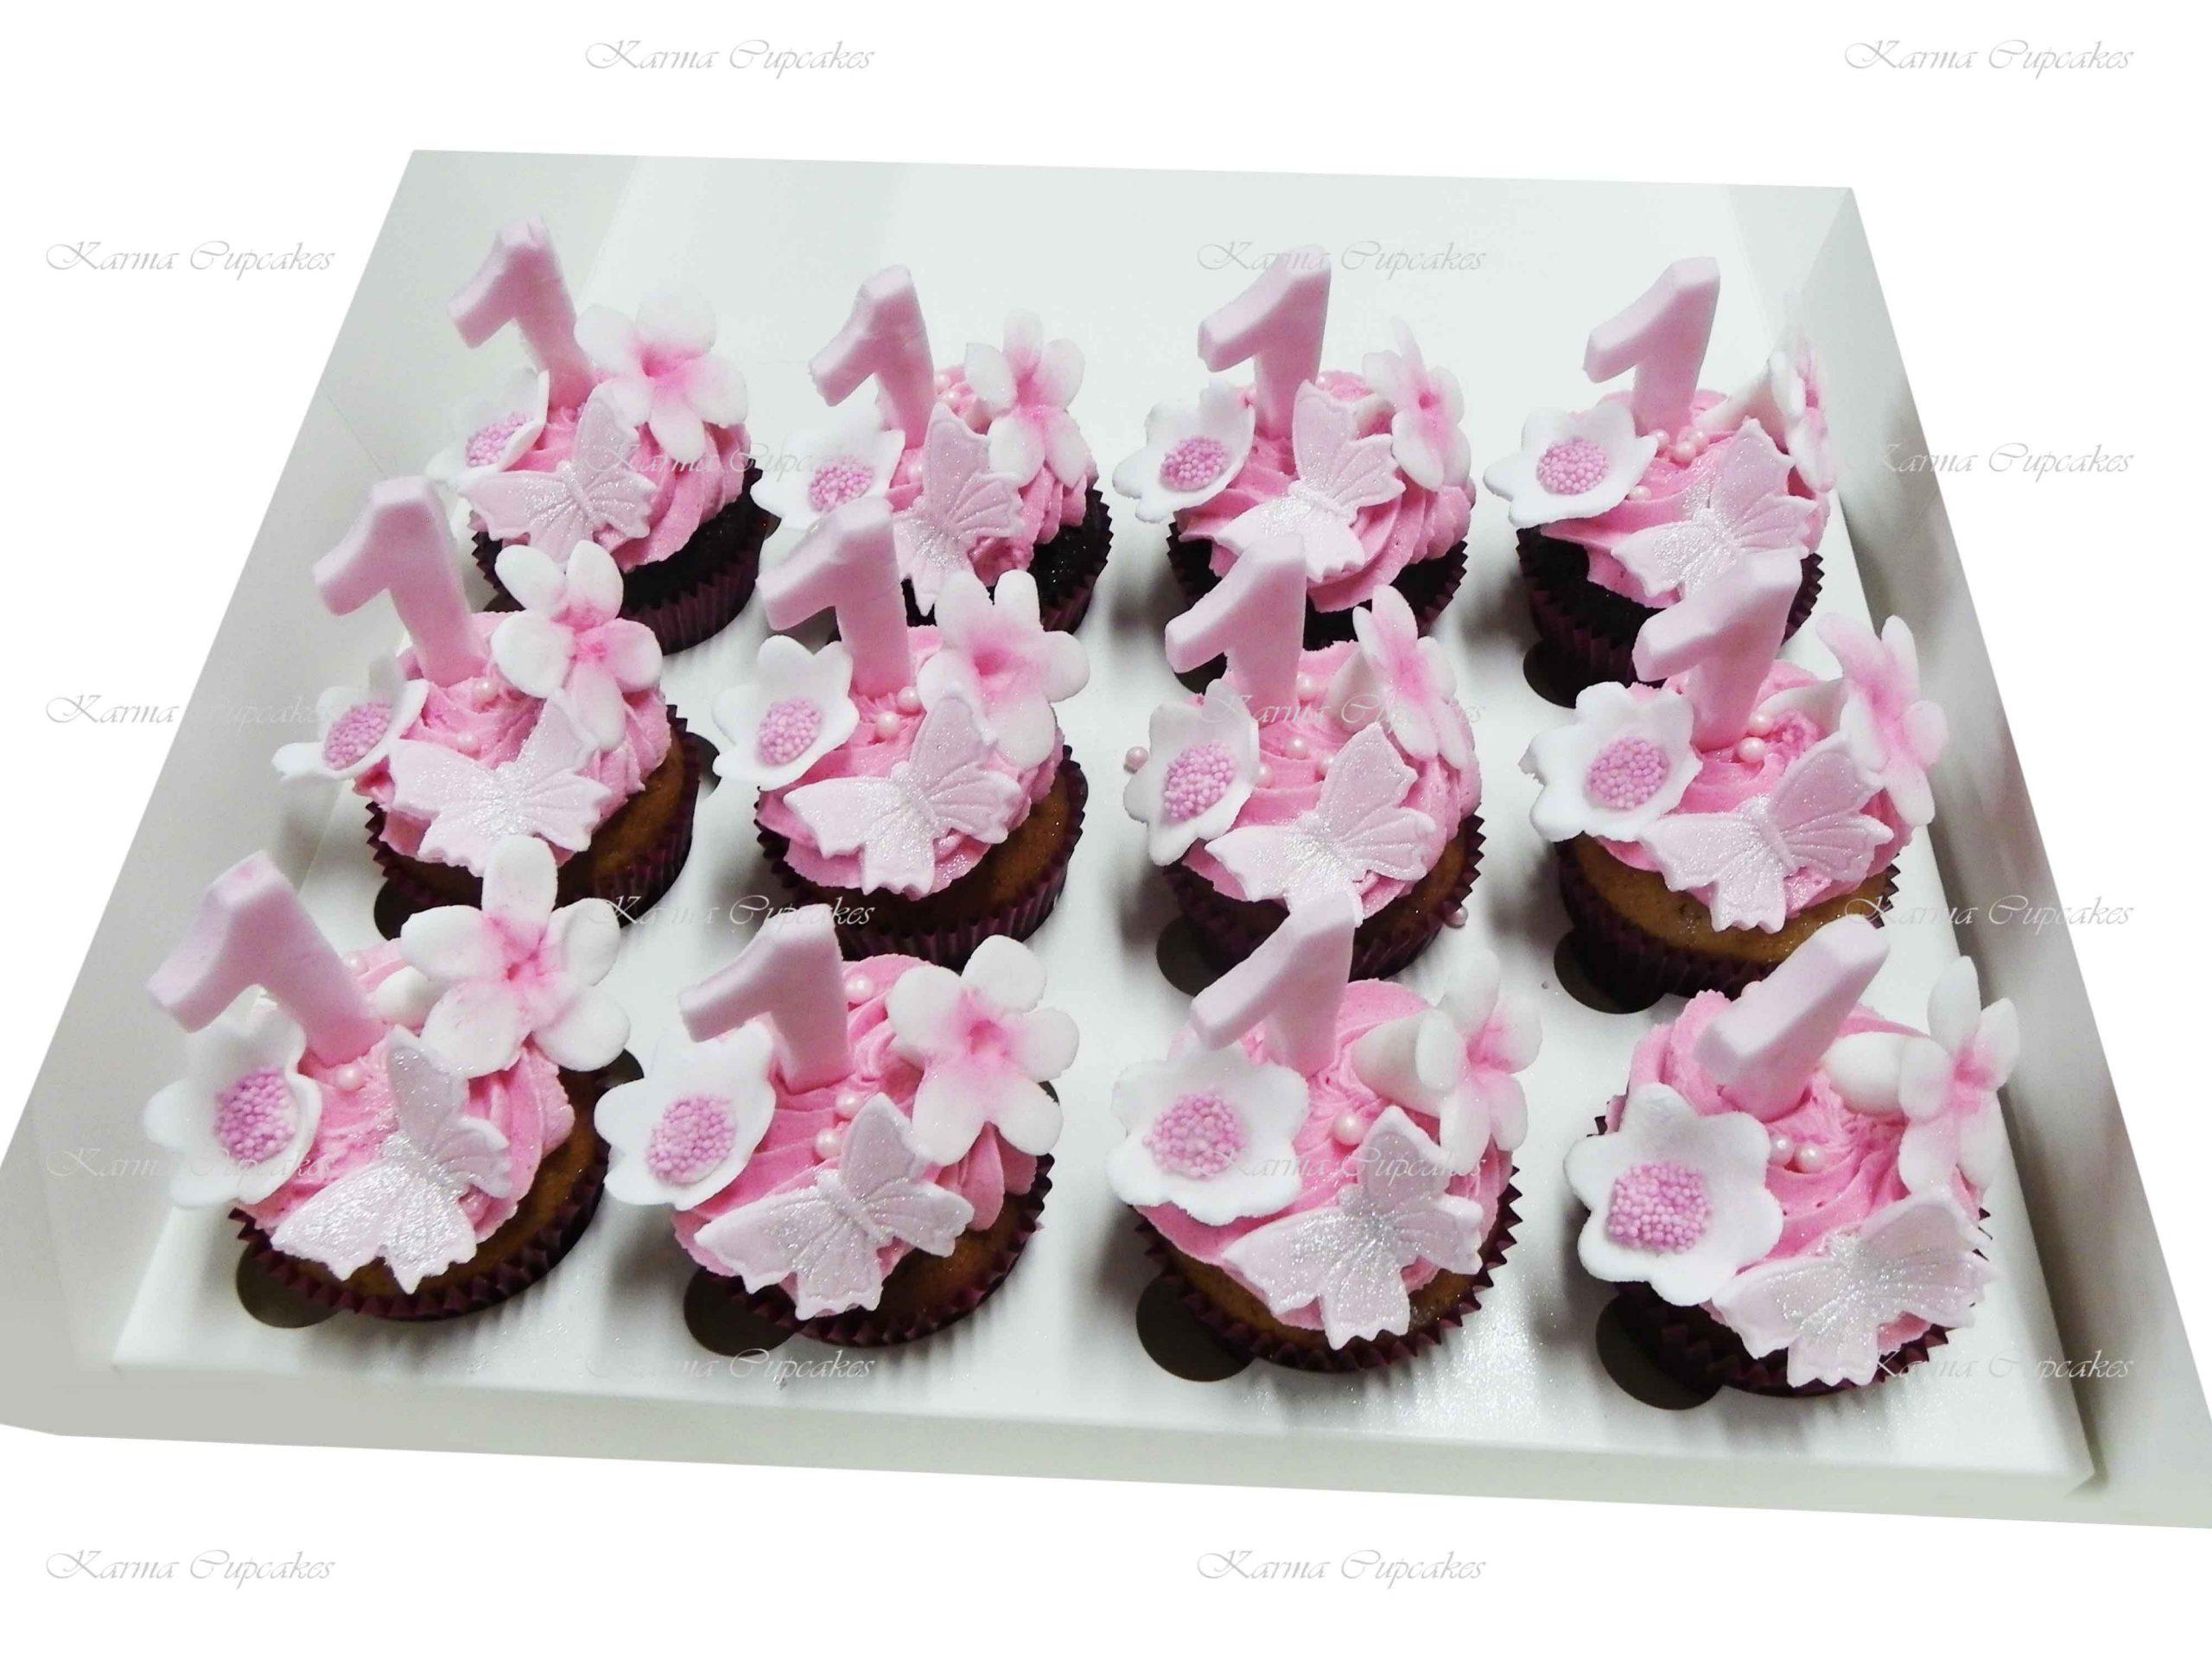 best cupcakes Gold Coast